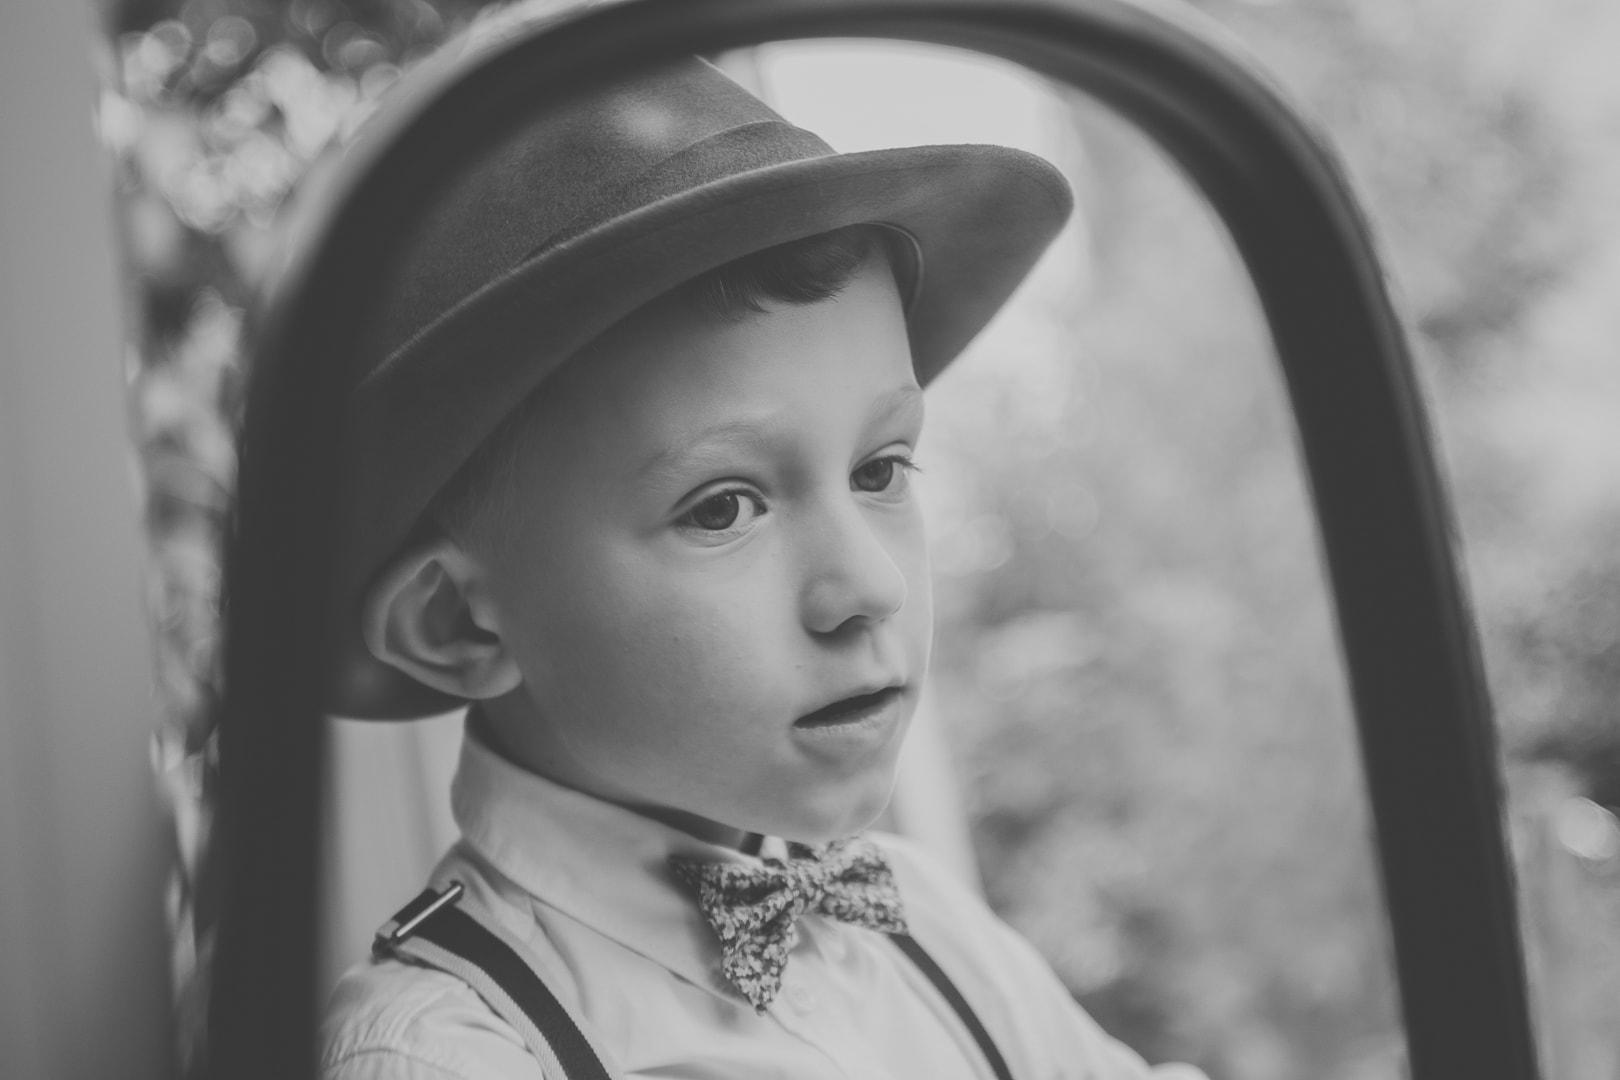 trezors-photography-photographe-professionnel-toulouse-31-enfance-seance-famille-lifestyle (16)